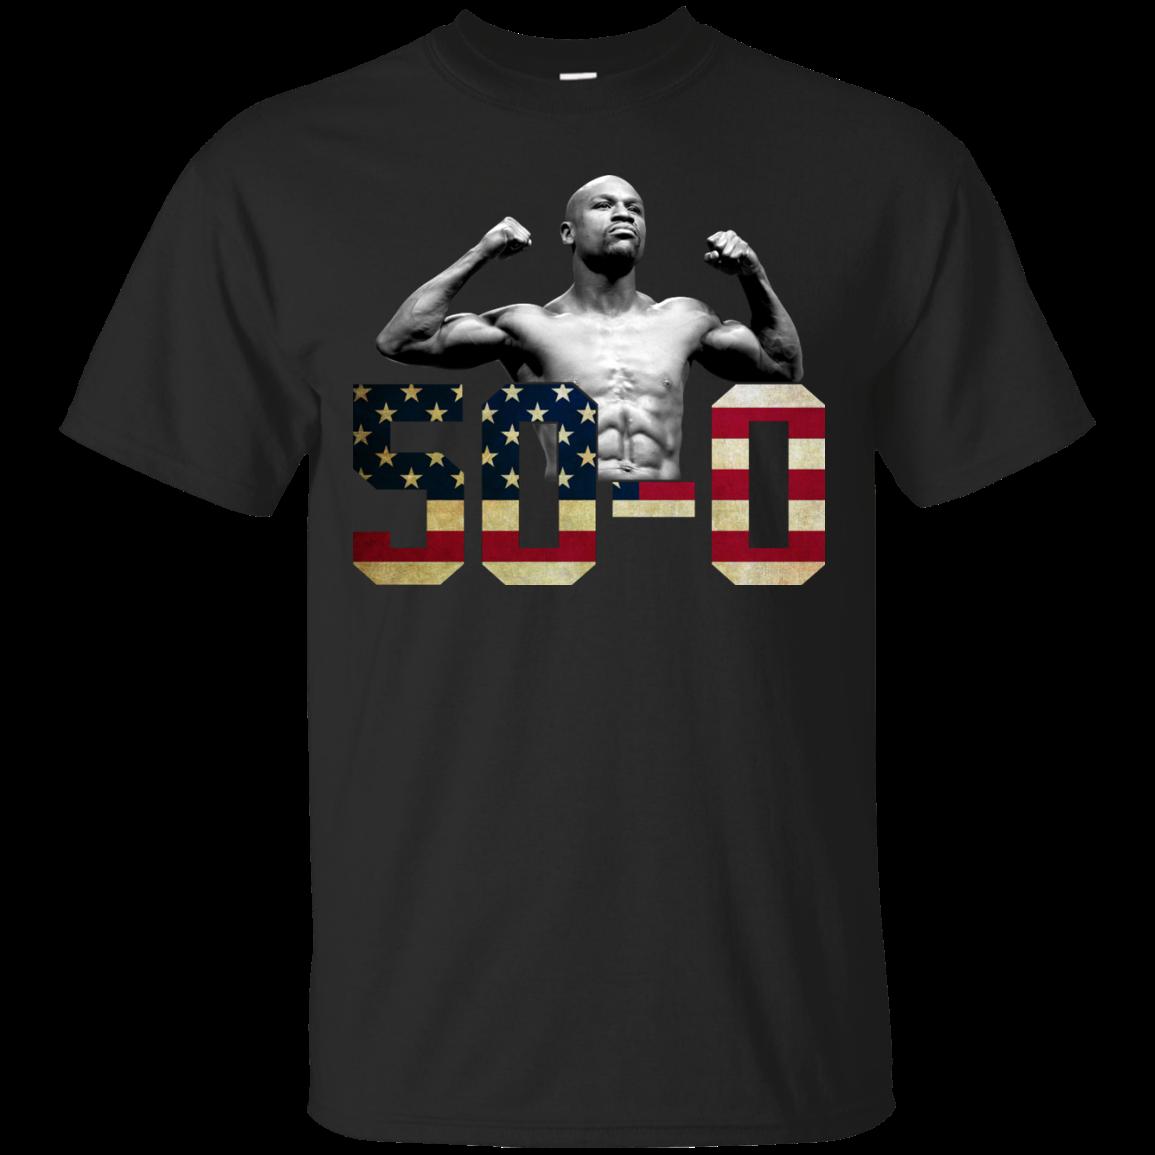 image 502px Floyd Mayweather 50 0 Shirt, Hoodies, Tank